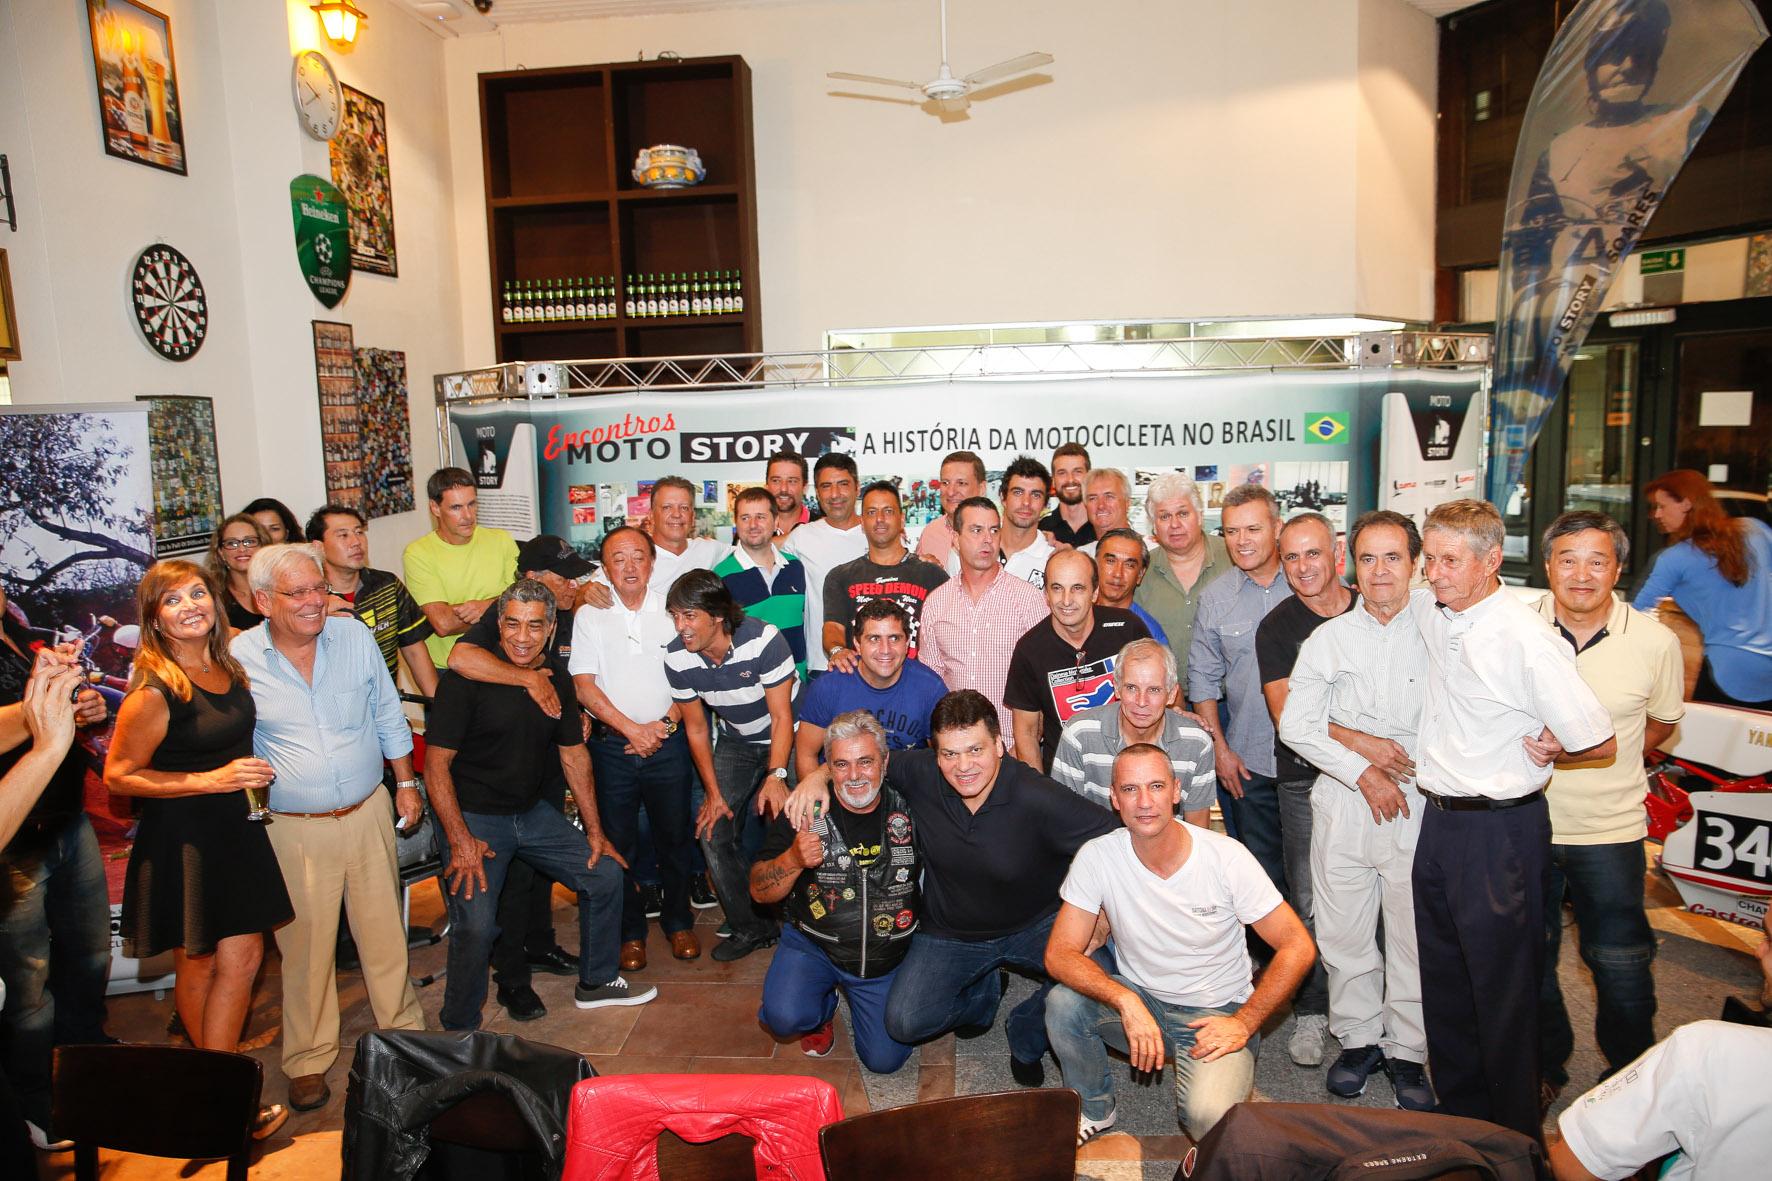 04/02/2015 - 1o Encontro Motostory: Daytona 83 349 - Foto: Haroldo Nogueira / Motostory